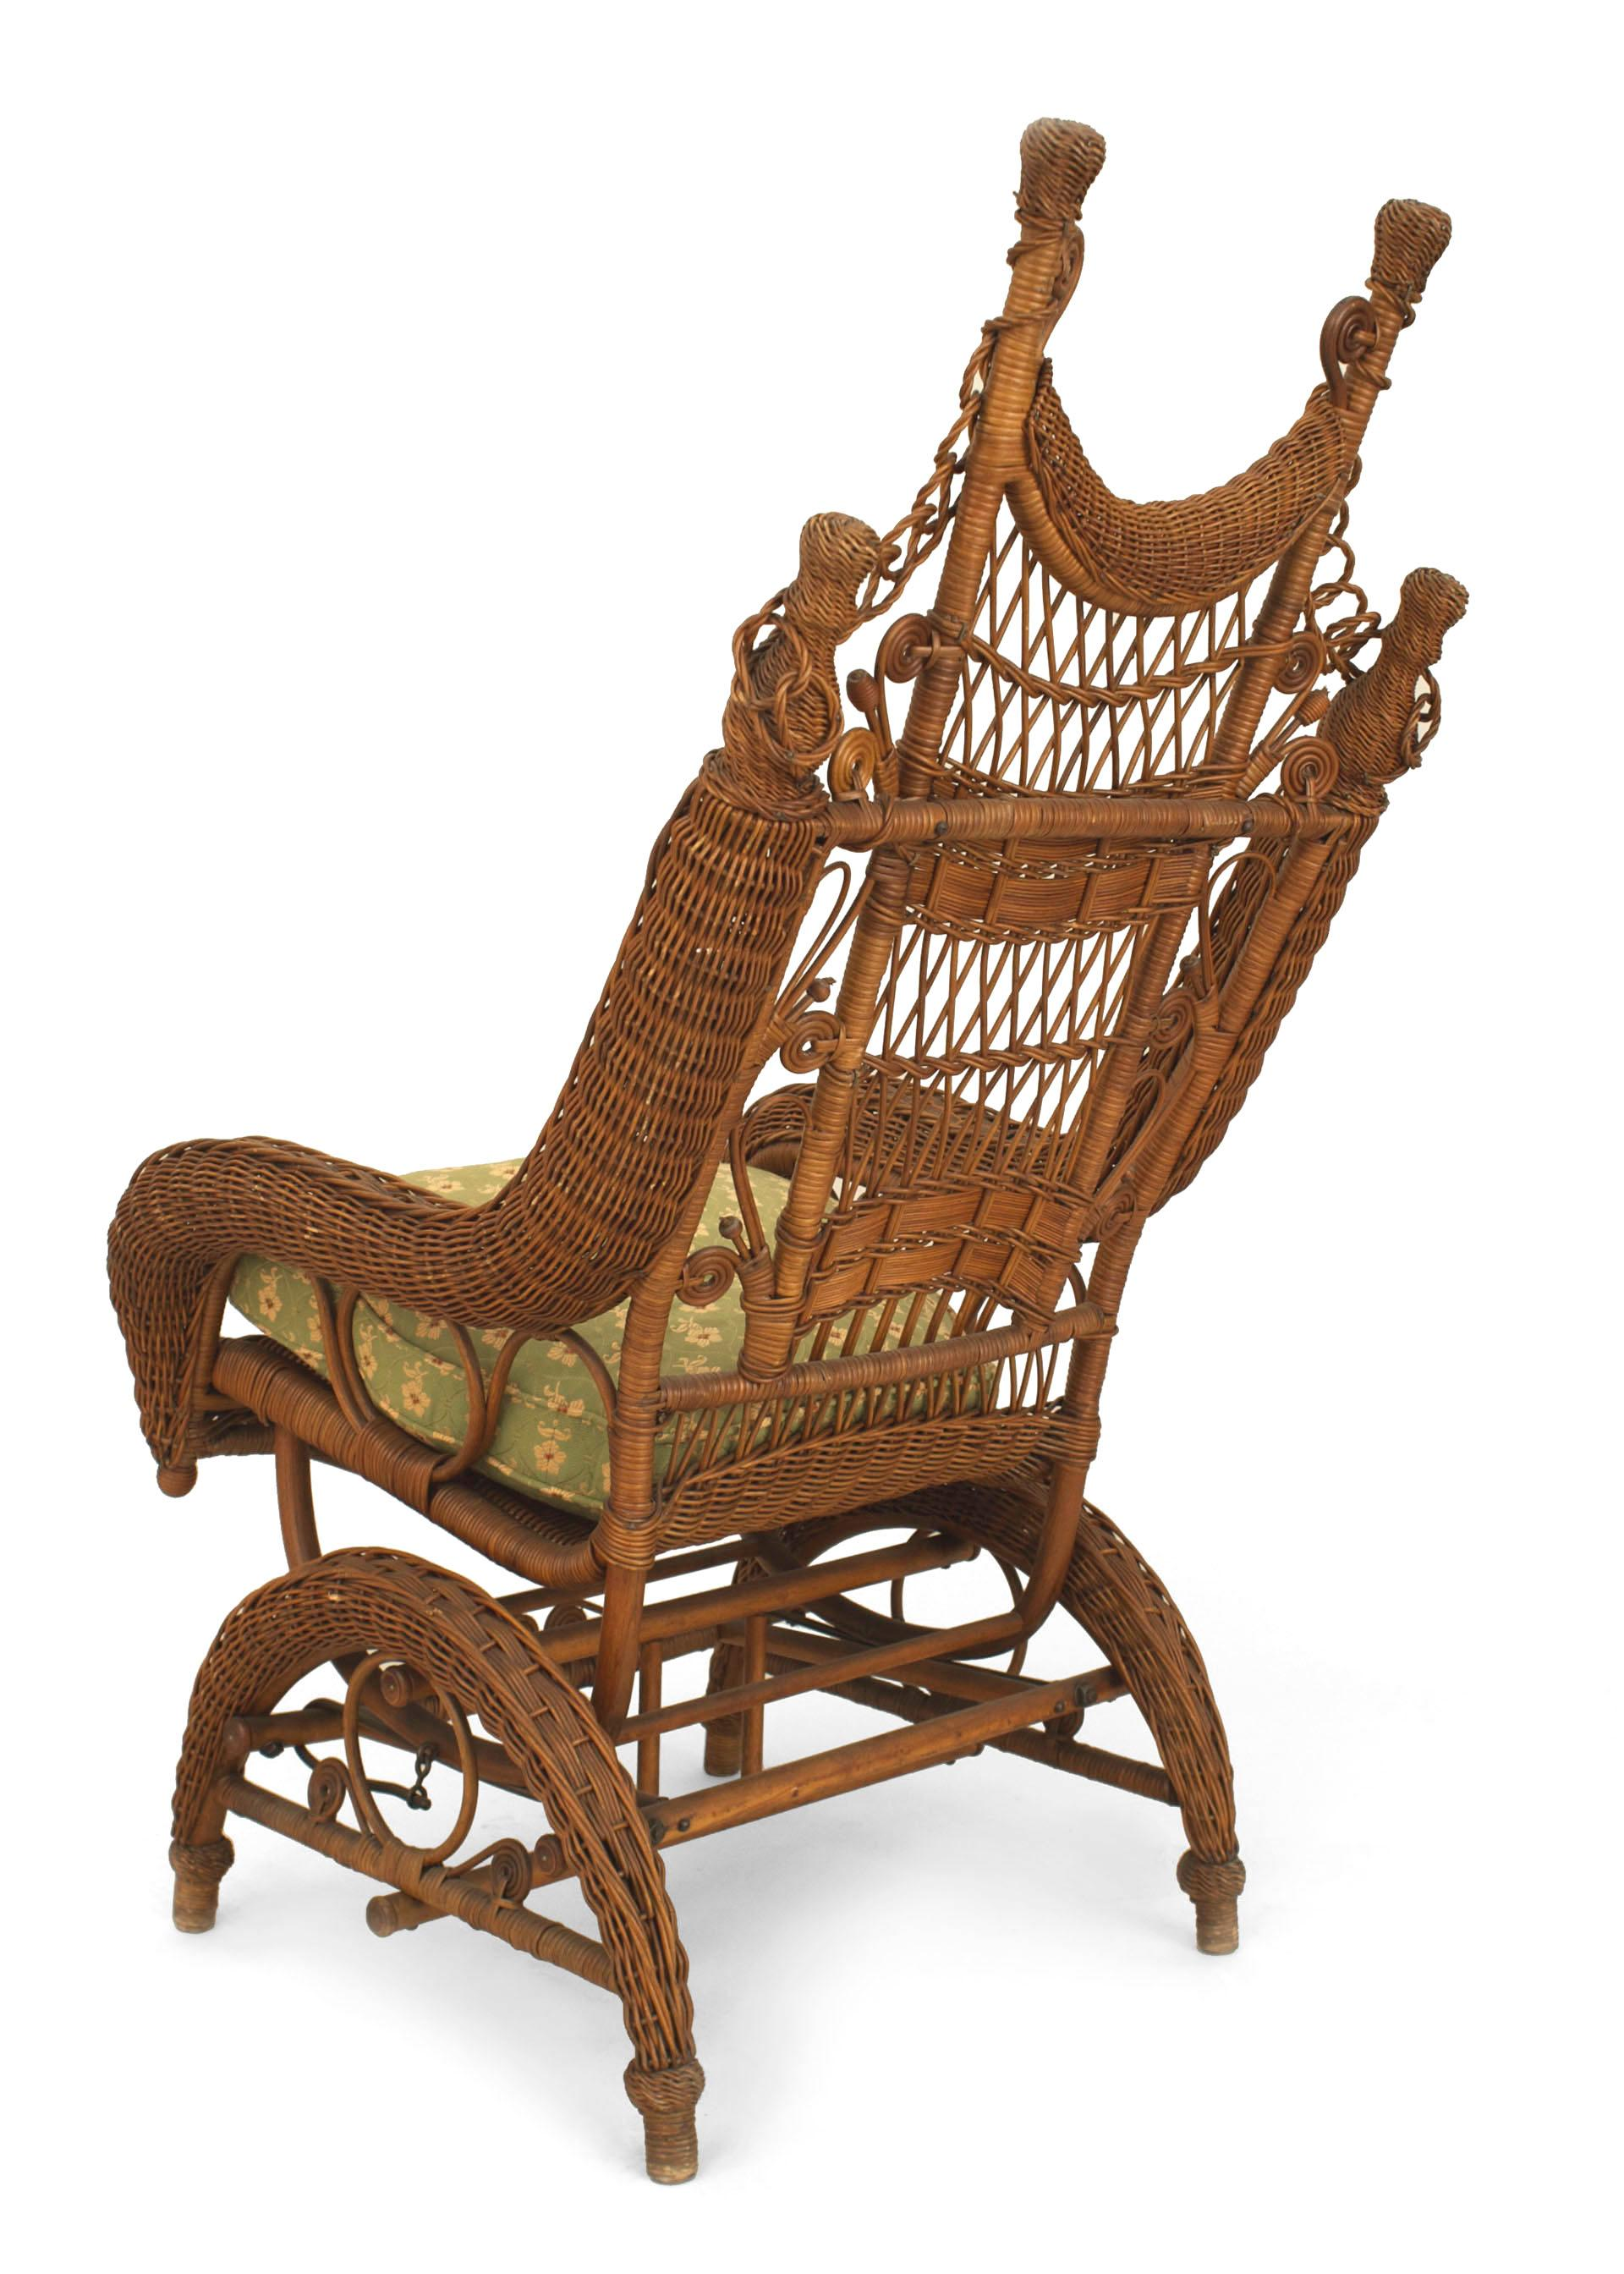 19th Century American Ornate High Back Wicker Rocking Chair